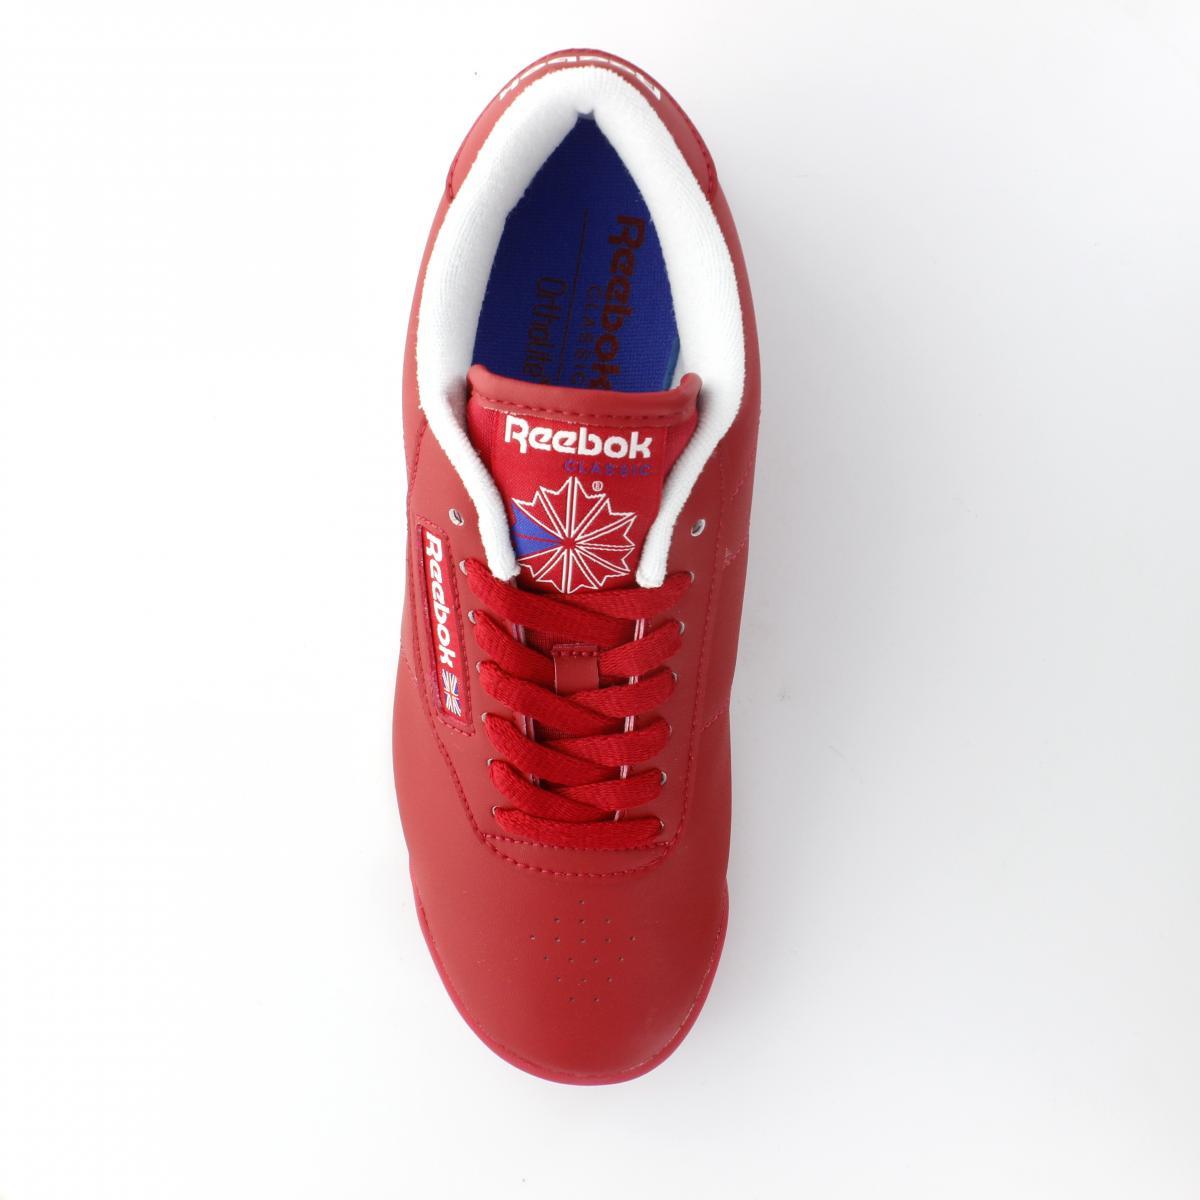 a78b7d4465ab6 ... Tenis para Mujer Reebok V68704 Color Rojo ...